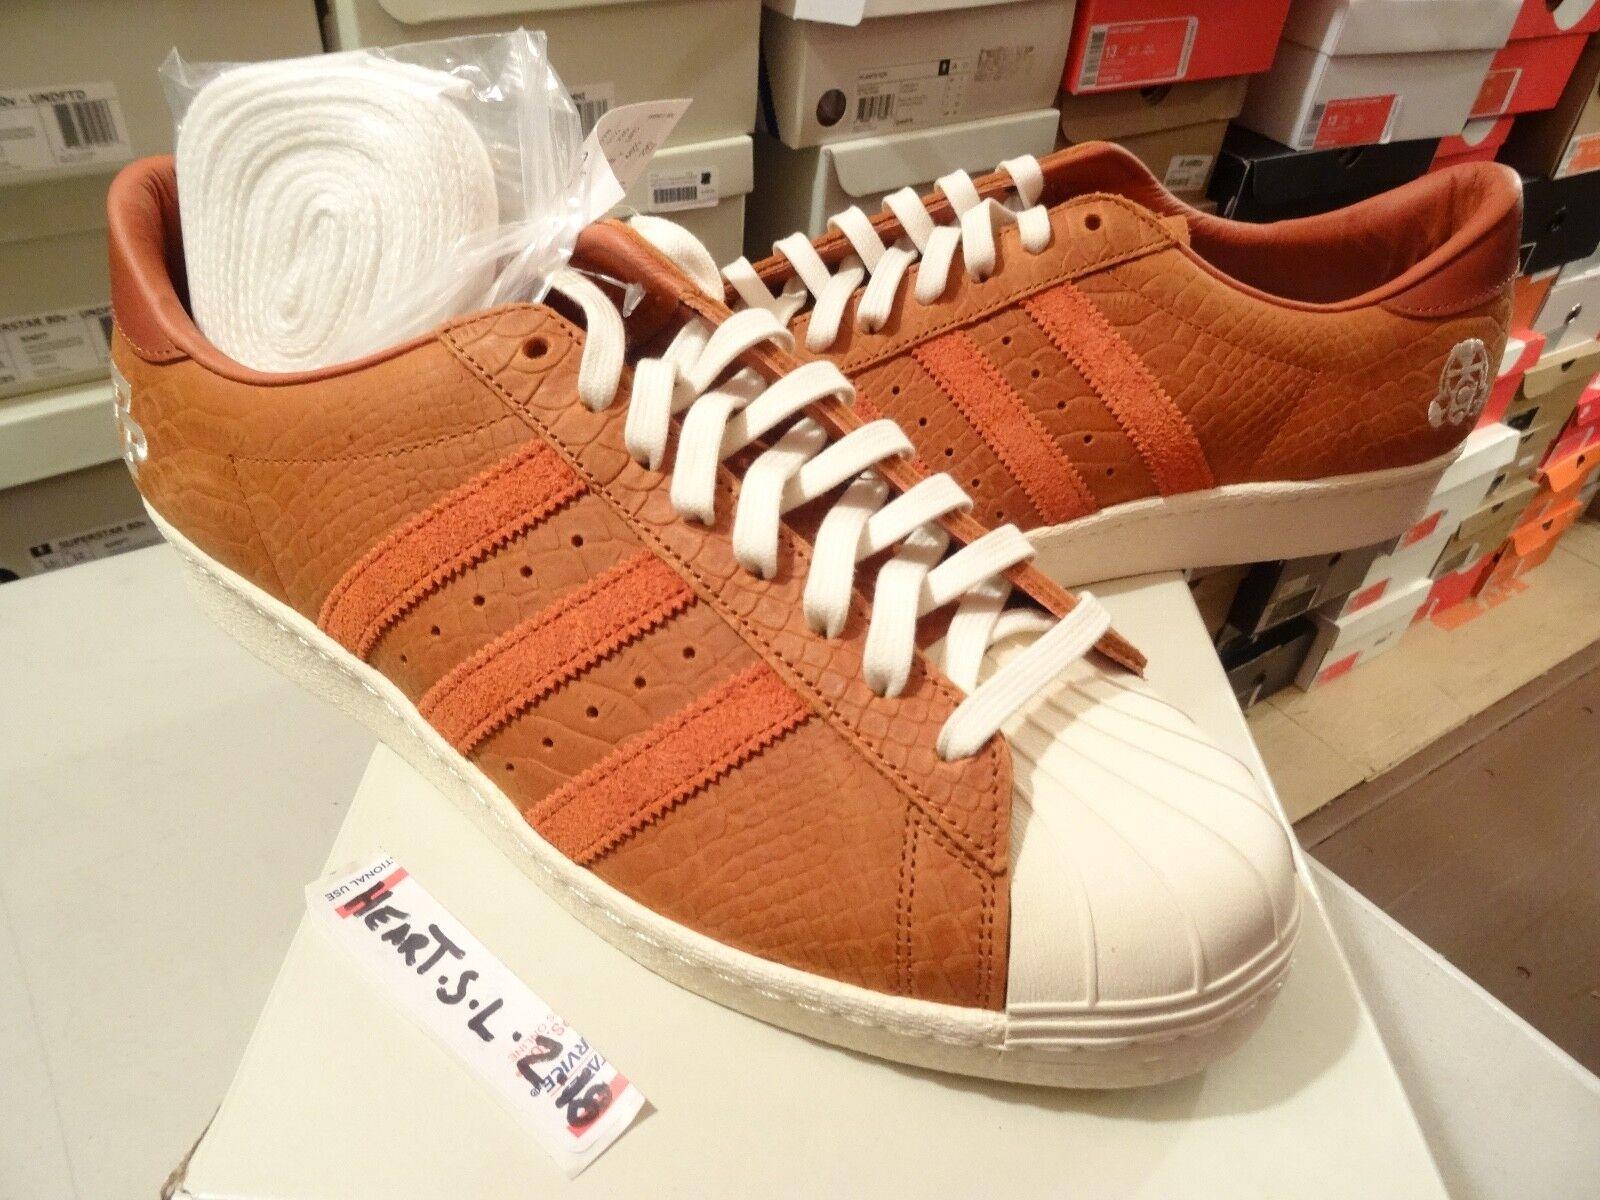 NEW Adidas x Footpatrol Consortium Superstar 80v FP Fox rot Weiß B34078 Sz 12.5